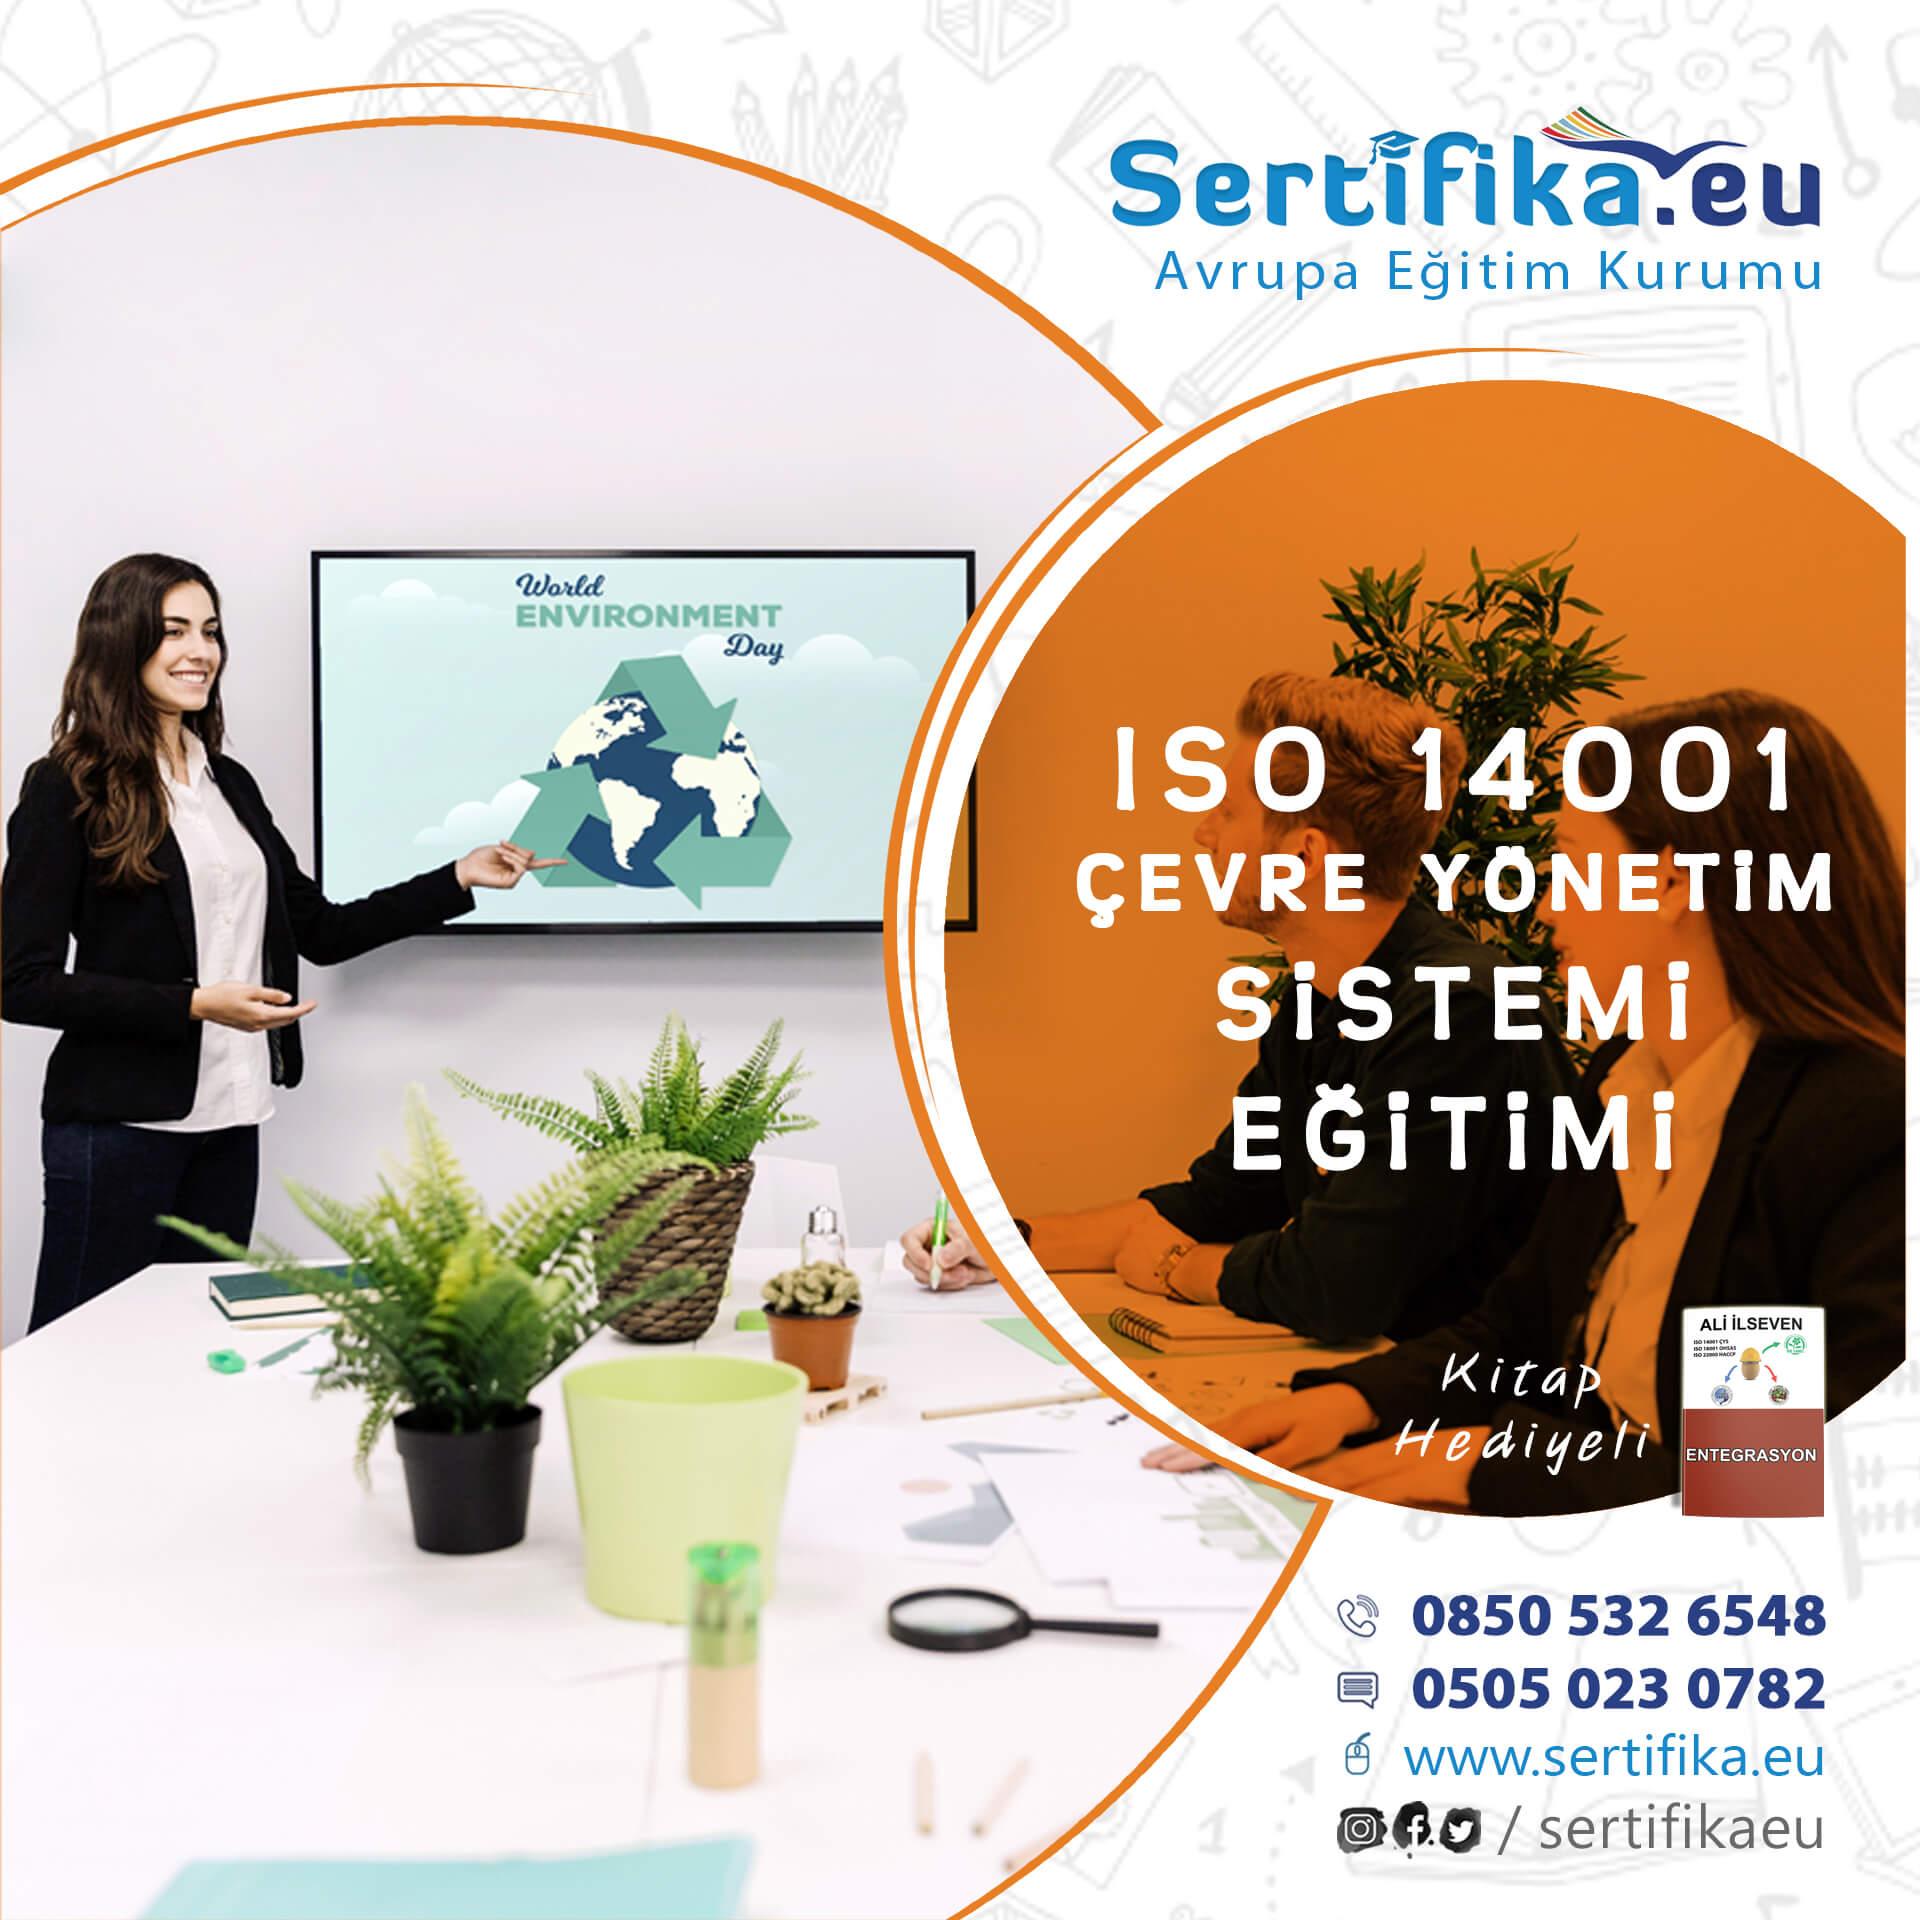 t-iso-14001-cevre-yonetim-sistemi-egitimi-kitap-hediyeli-sertifikaeu